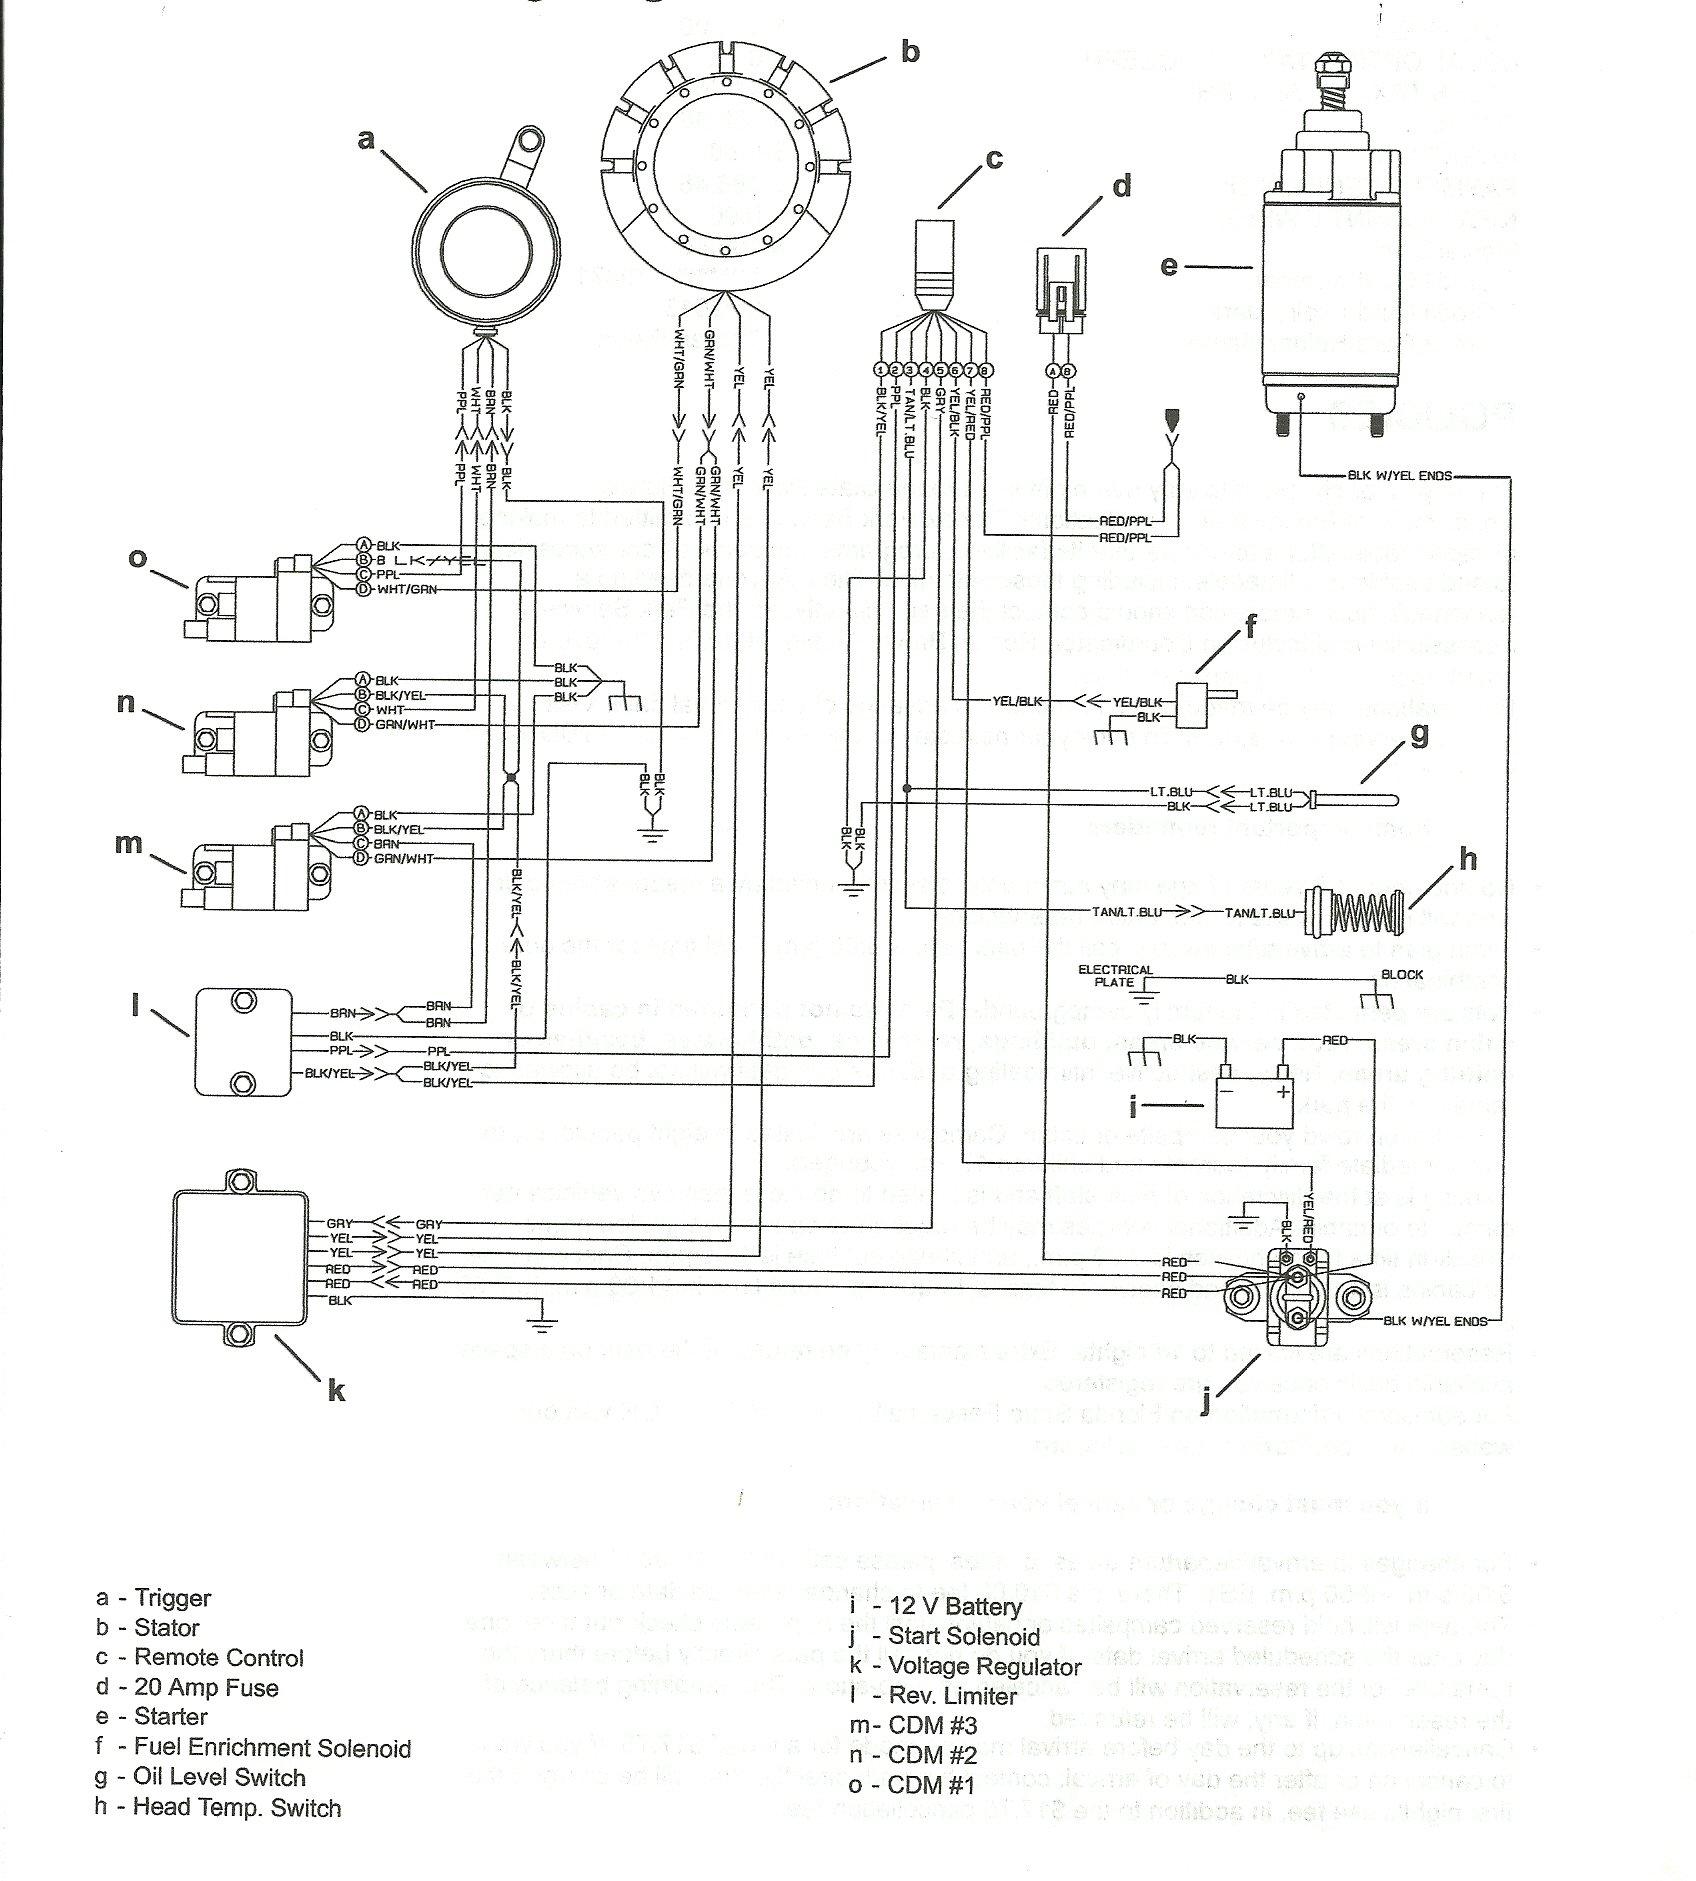 Bass Tracker 175 Pro Crappie Wiring Diagram